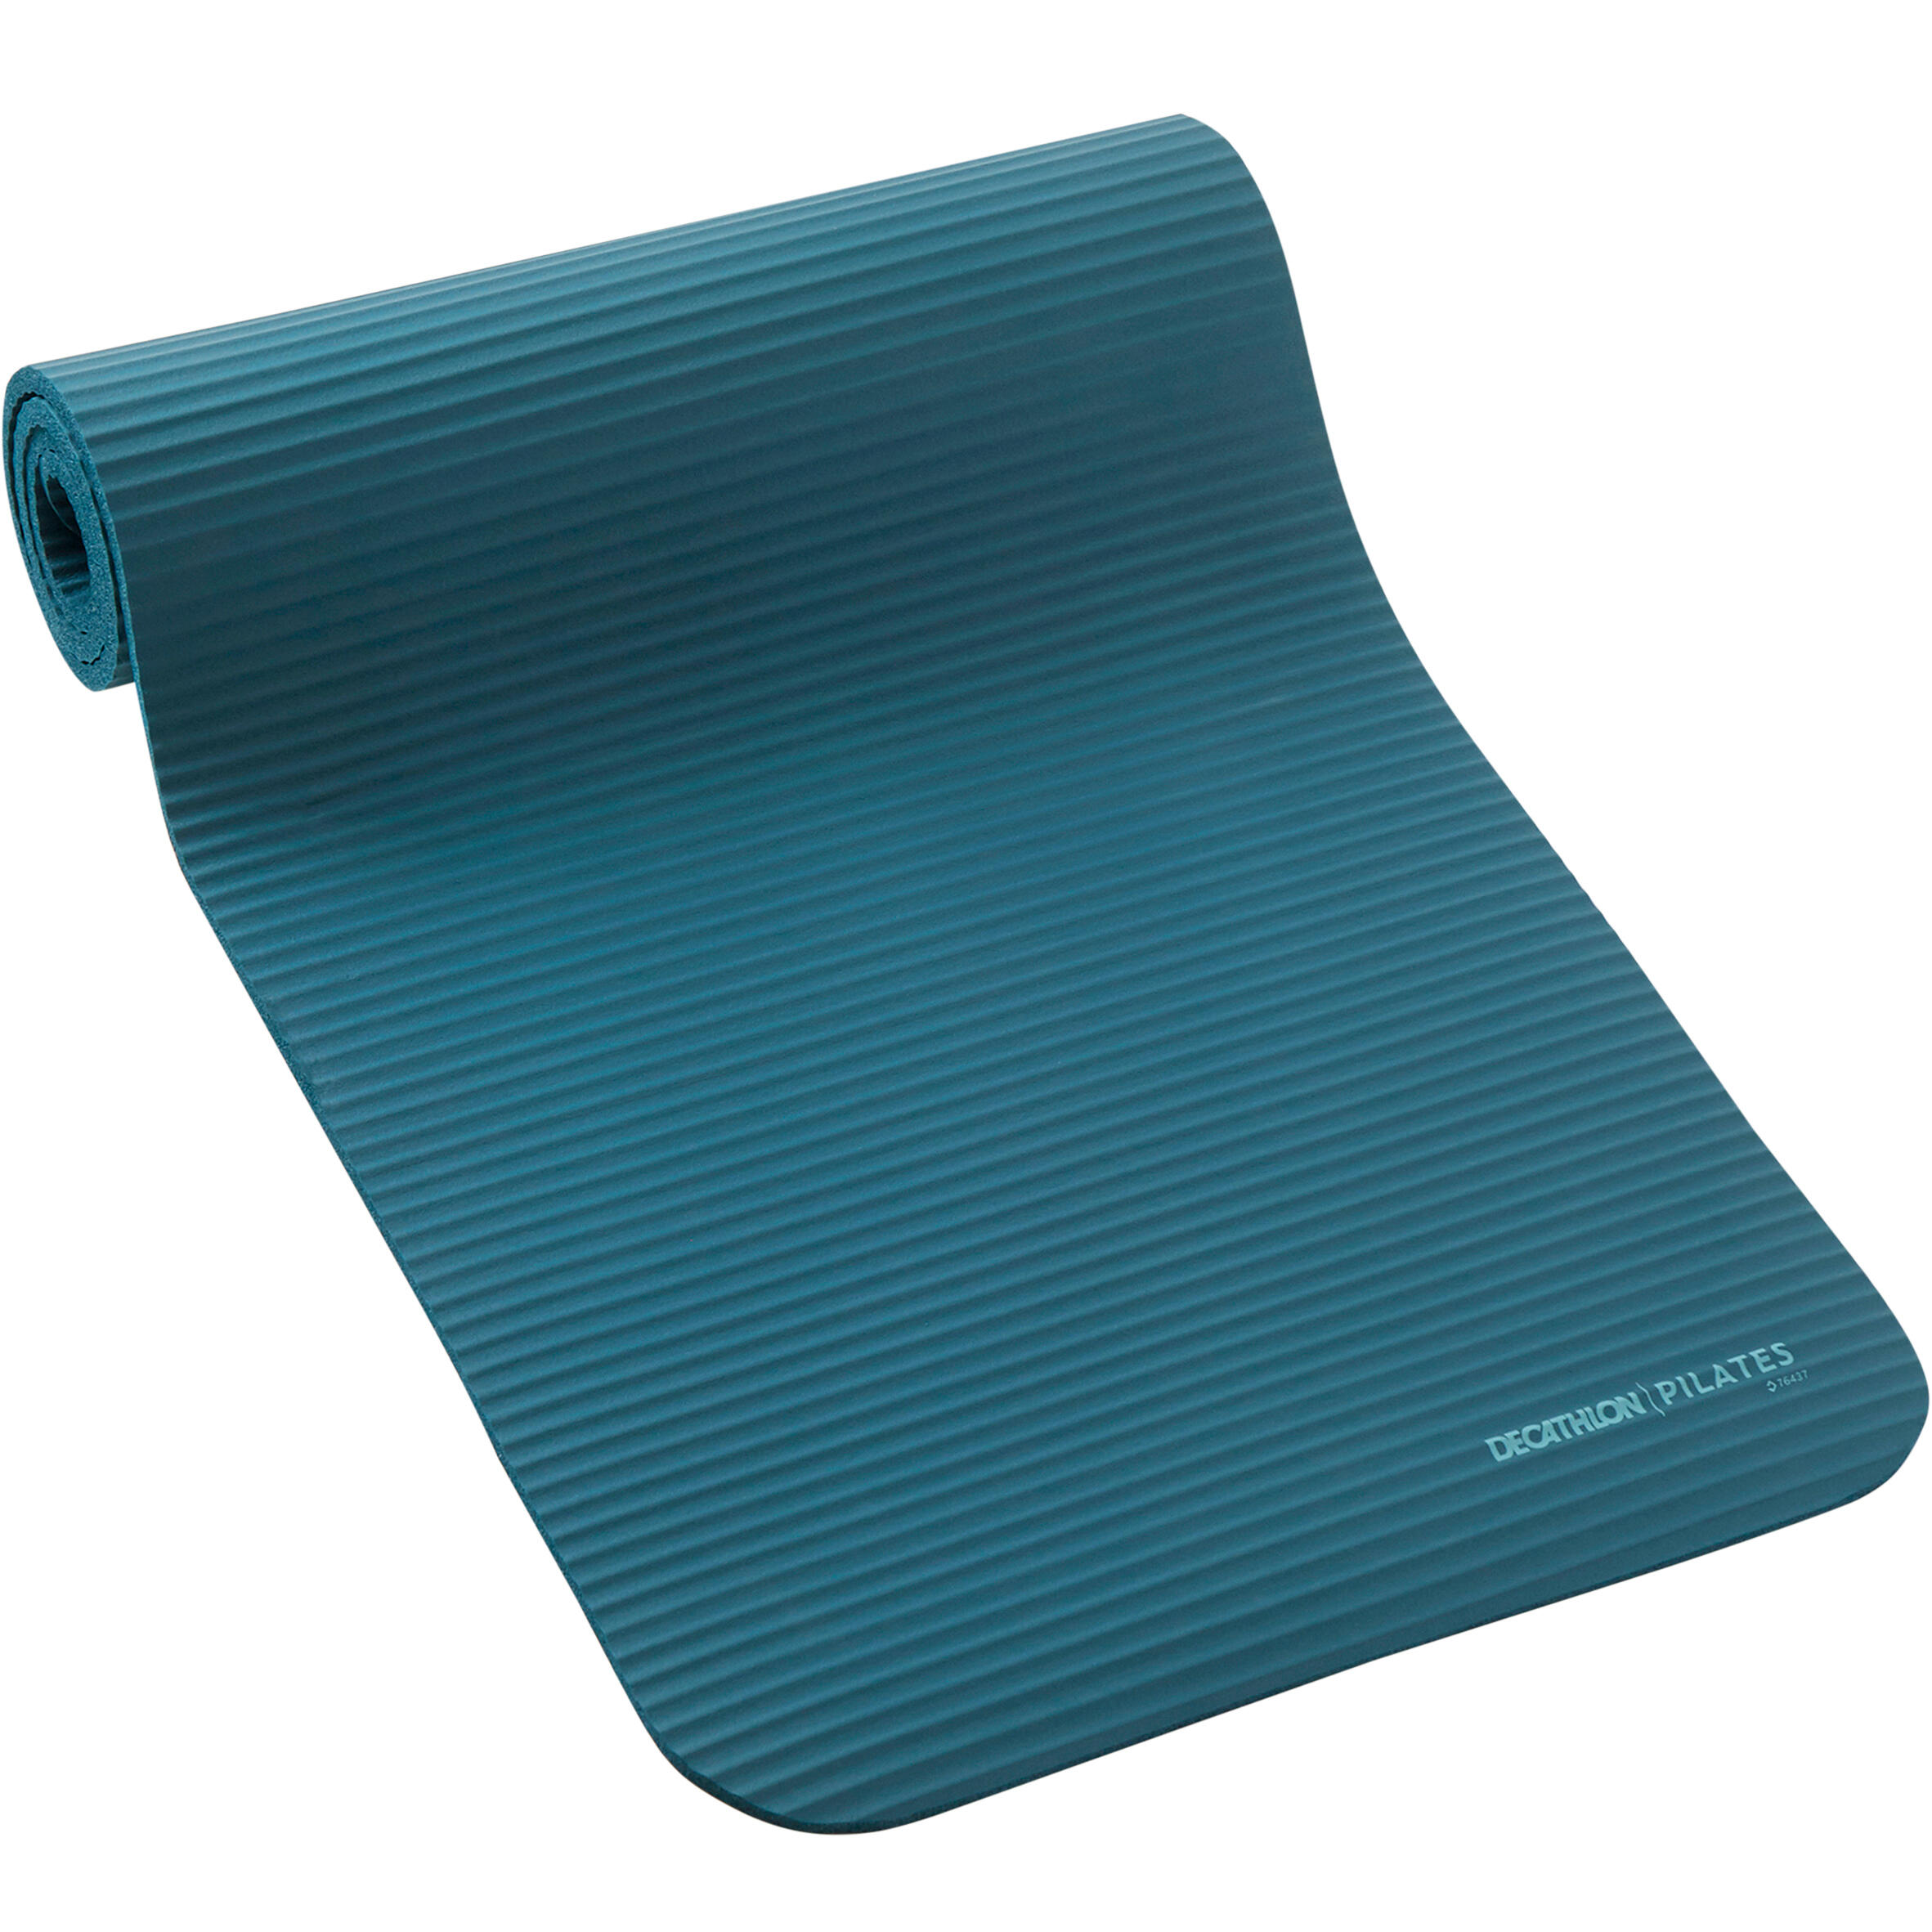 100 Comfort Pilates...